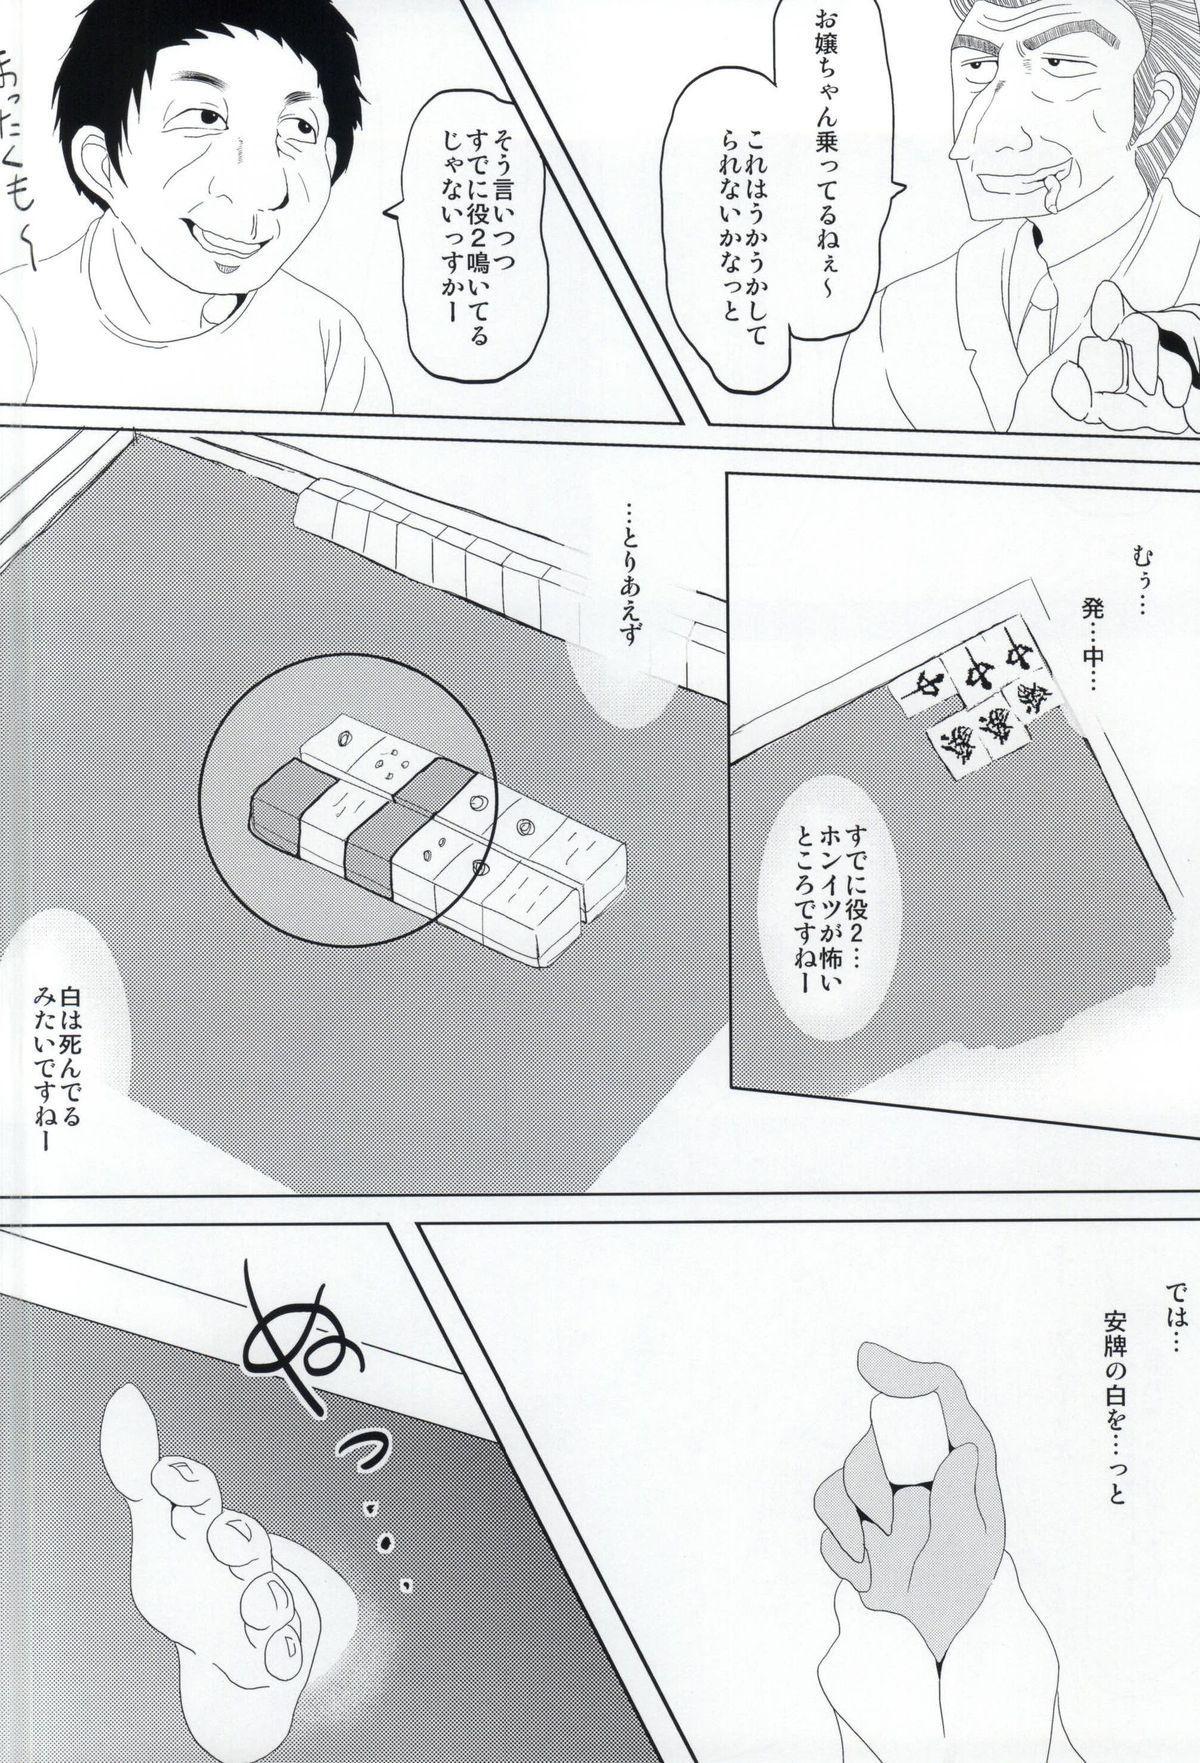 Hacchan Kaimen desu yo- 7